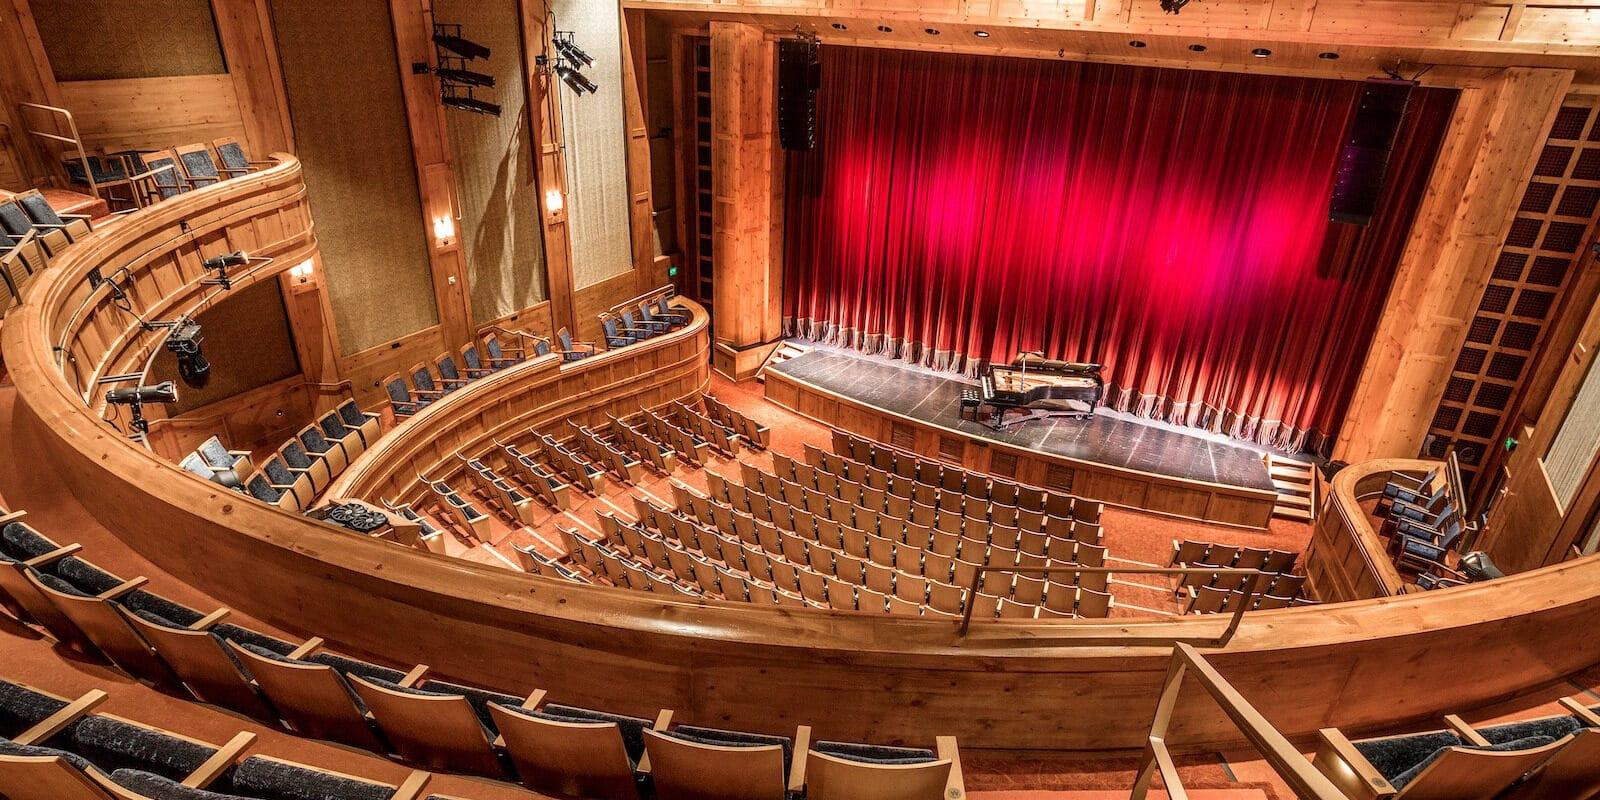 Image of Vilar Performing Arts Center in Beaver Creek, Colorado